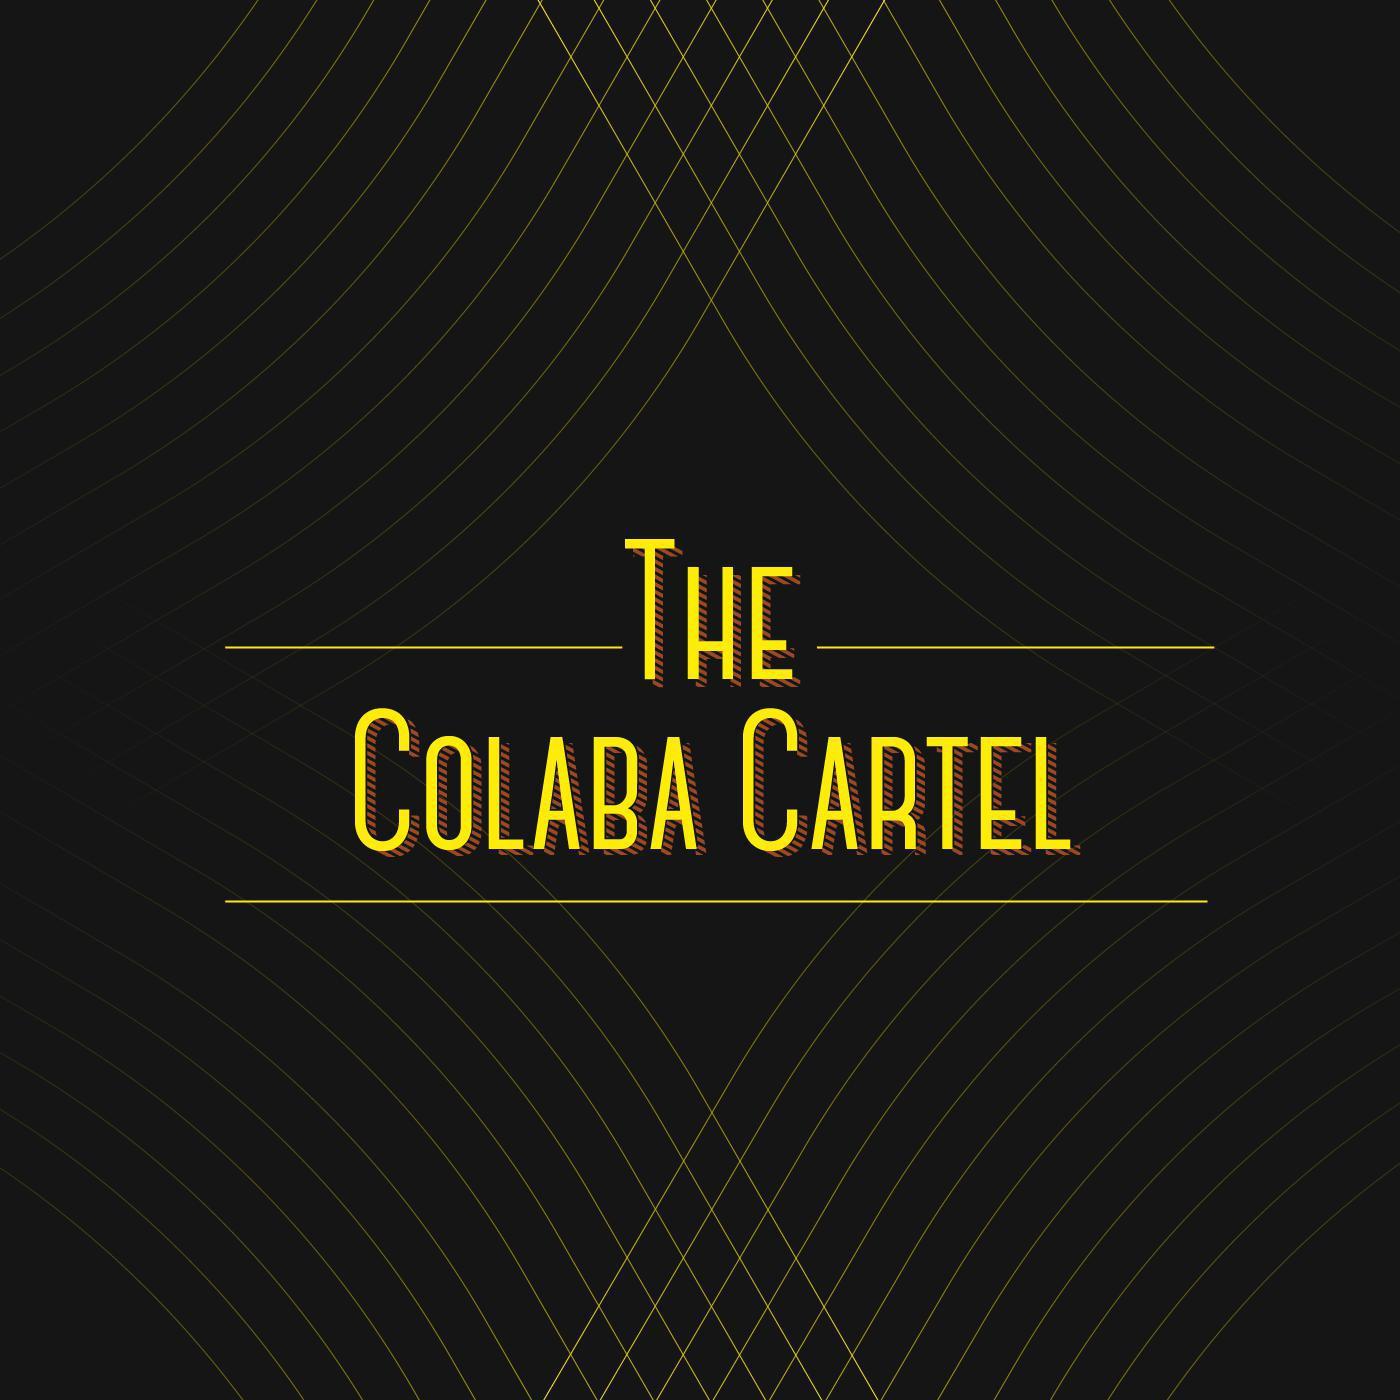 The Colaba Cartel |